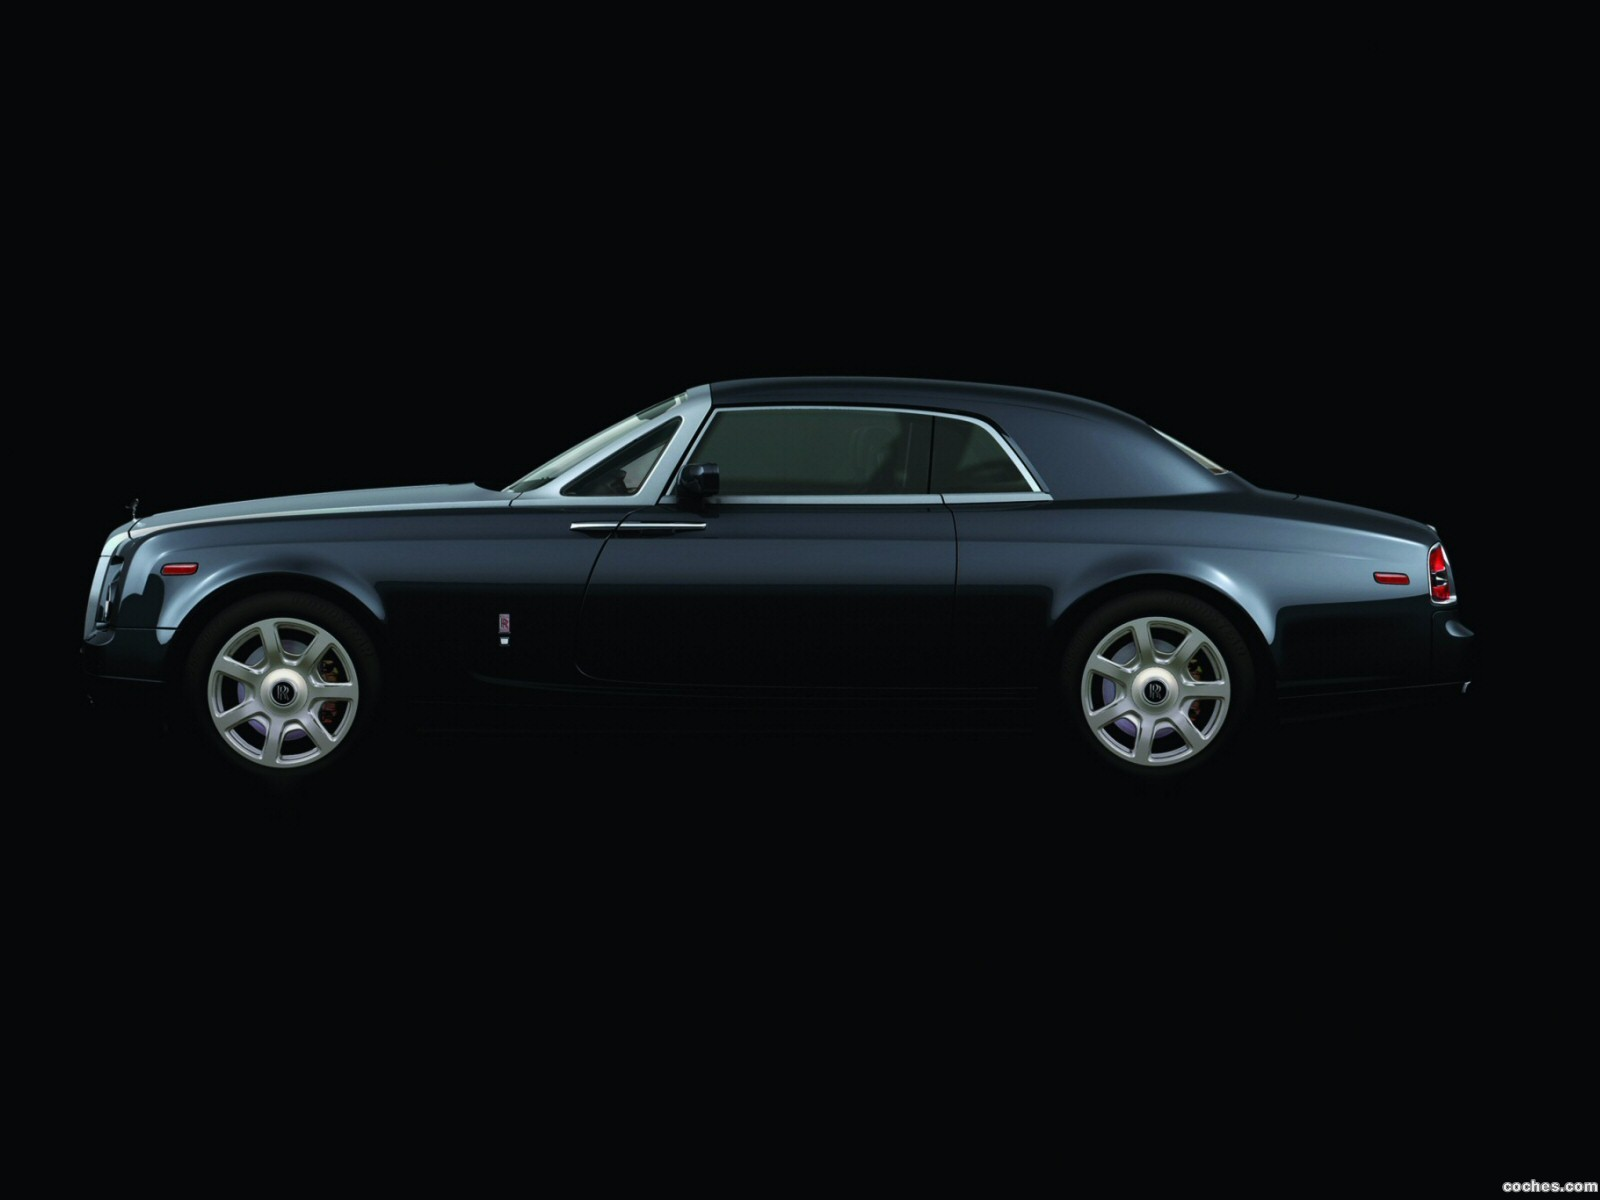 Foto 1 de Rolls Royce 101 EX Concept 2006